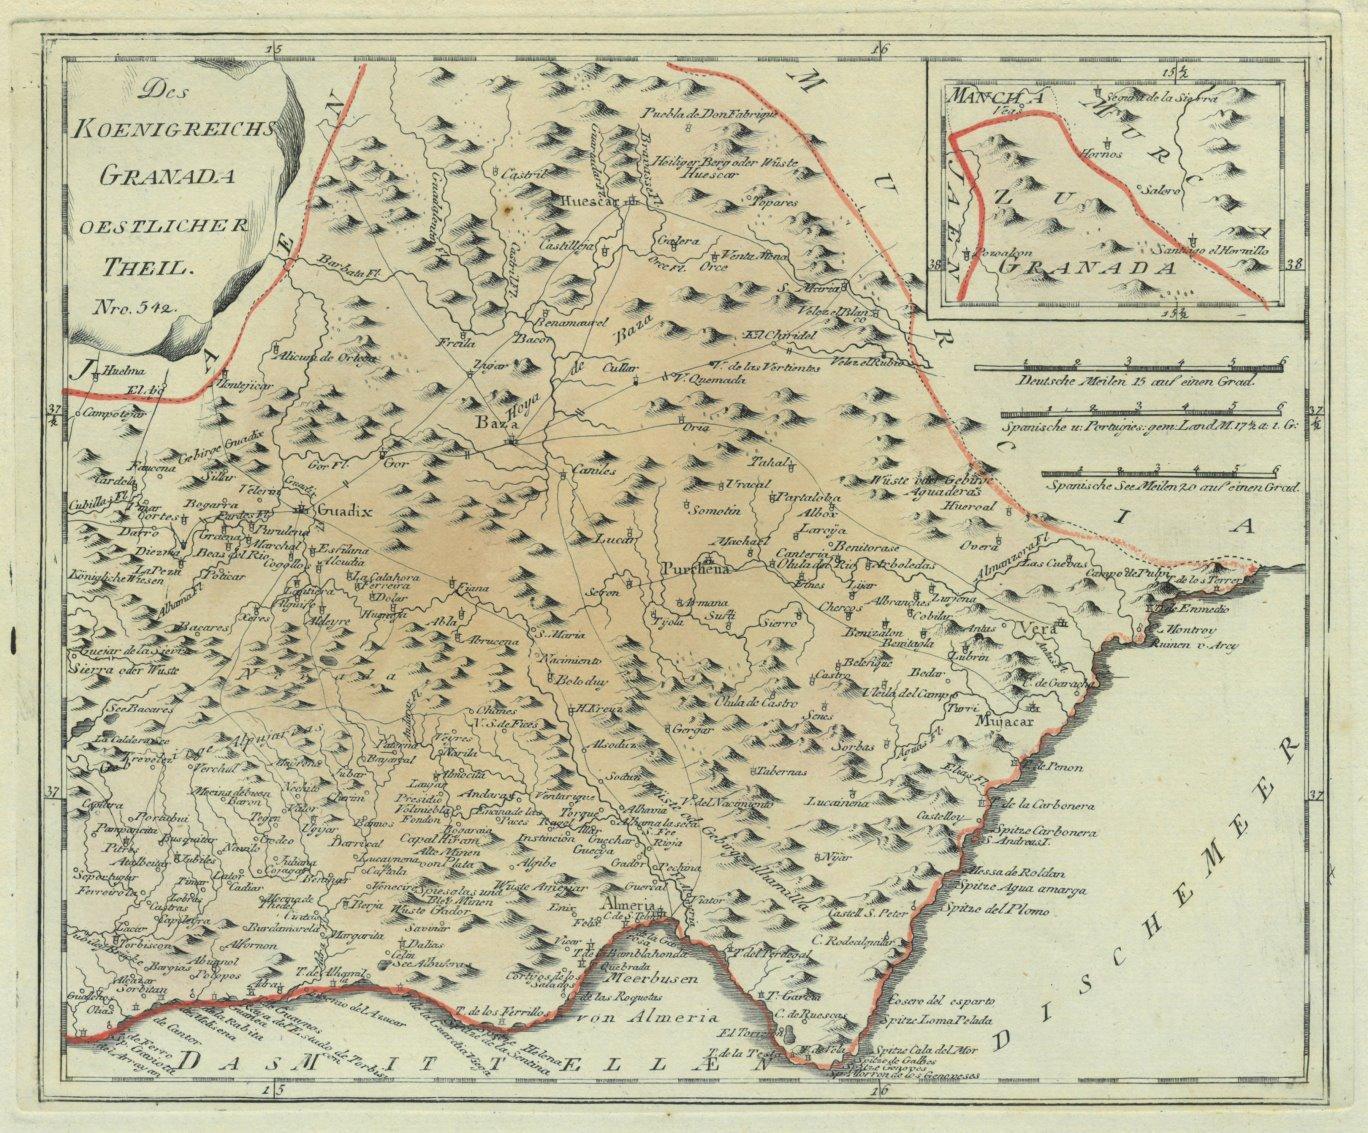 Granada Karte.Granada Karte Des Zvab